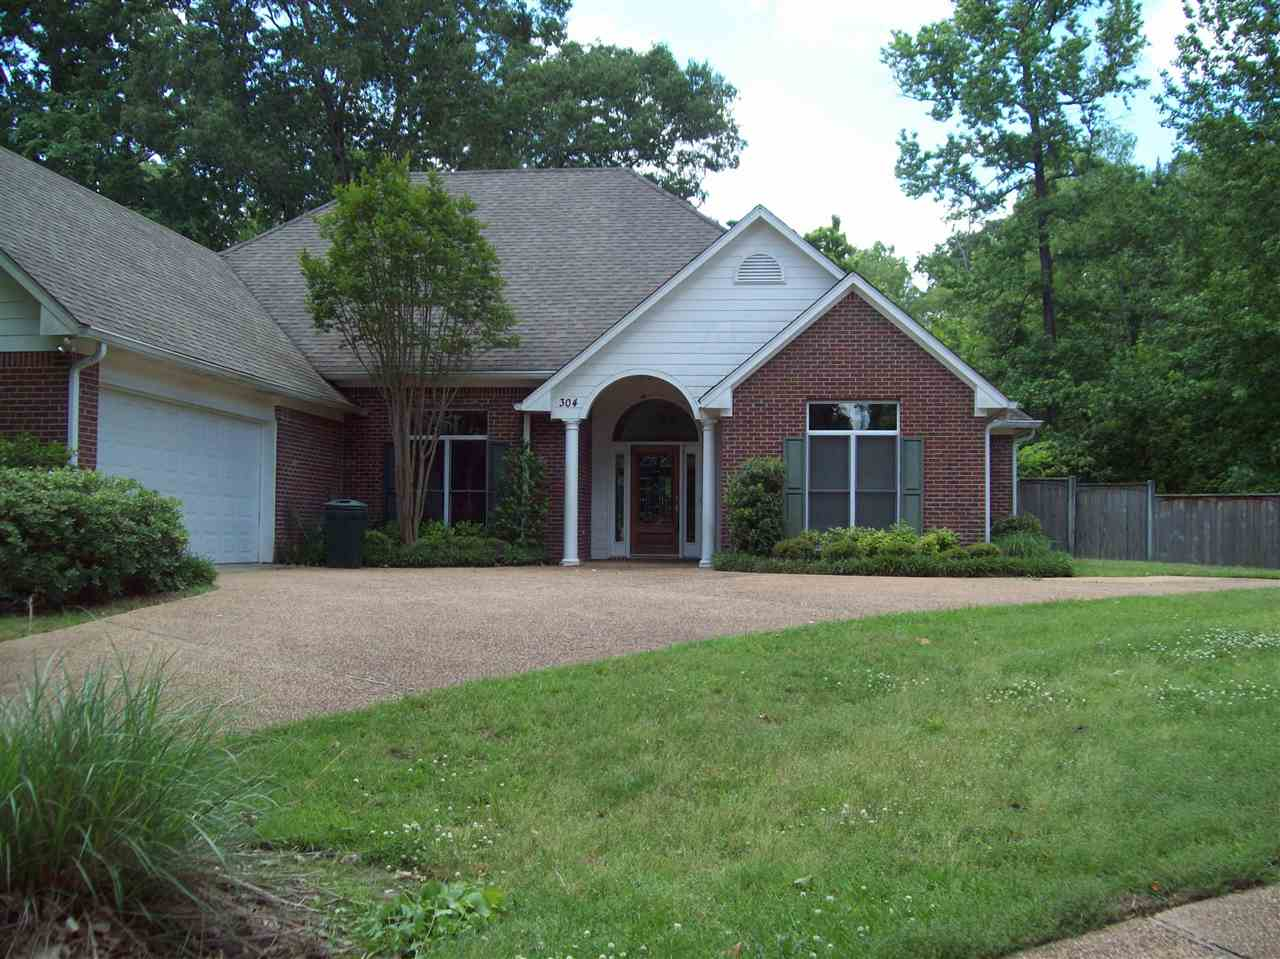 Real Estate for Sale, ListingId: 36985806, Ridgeland,MS39157